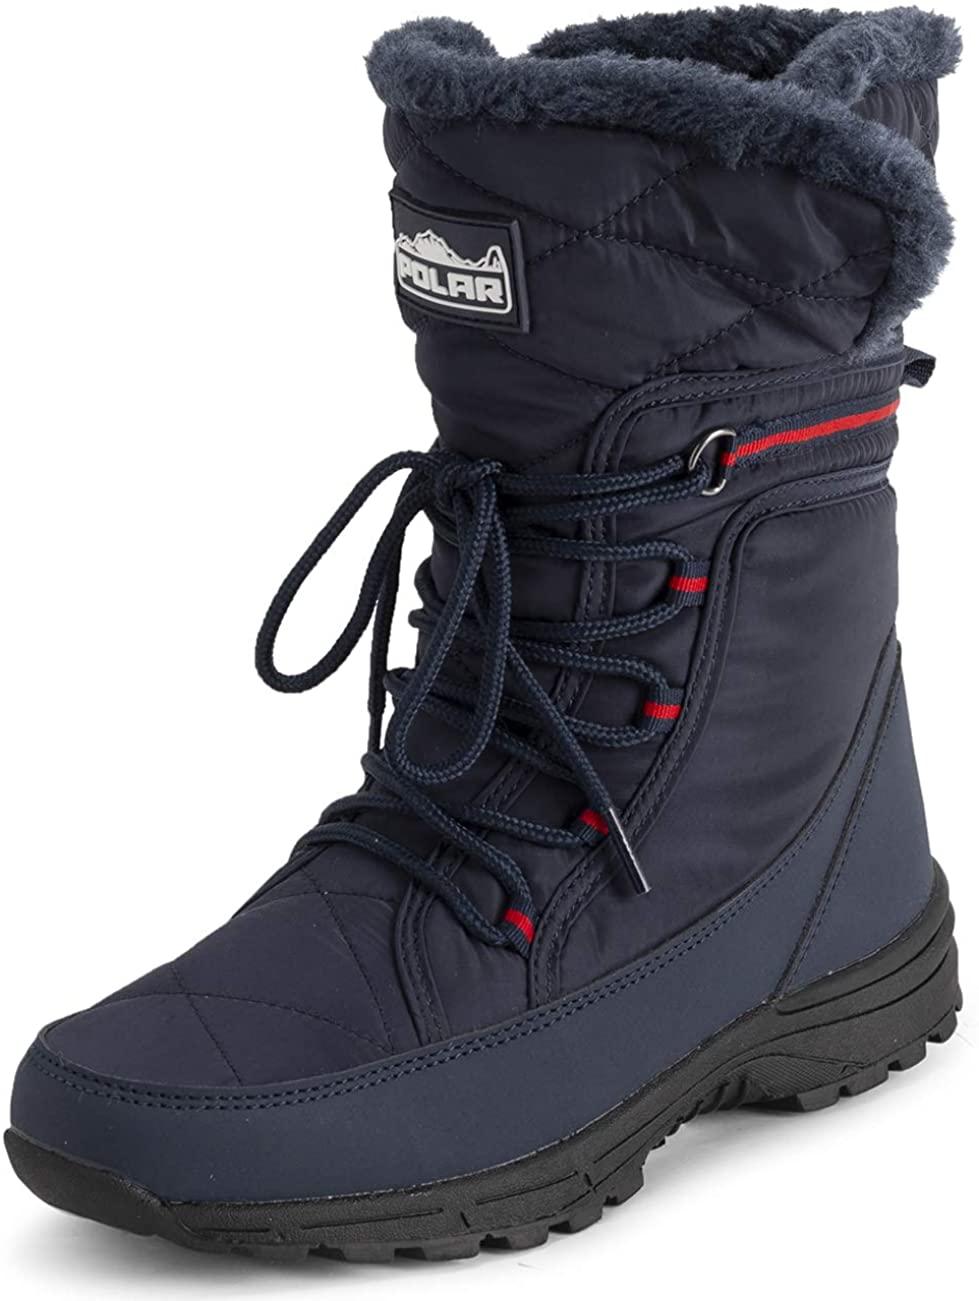 Polar Womens Memory Foam Faux Fur Cuff Deep Tread Non Slip Rubber Sole Winter Snow Thermal Outdoor Boots - Navy - EU38/US7 - YC0704